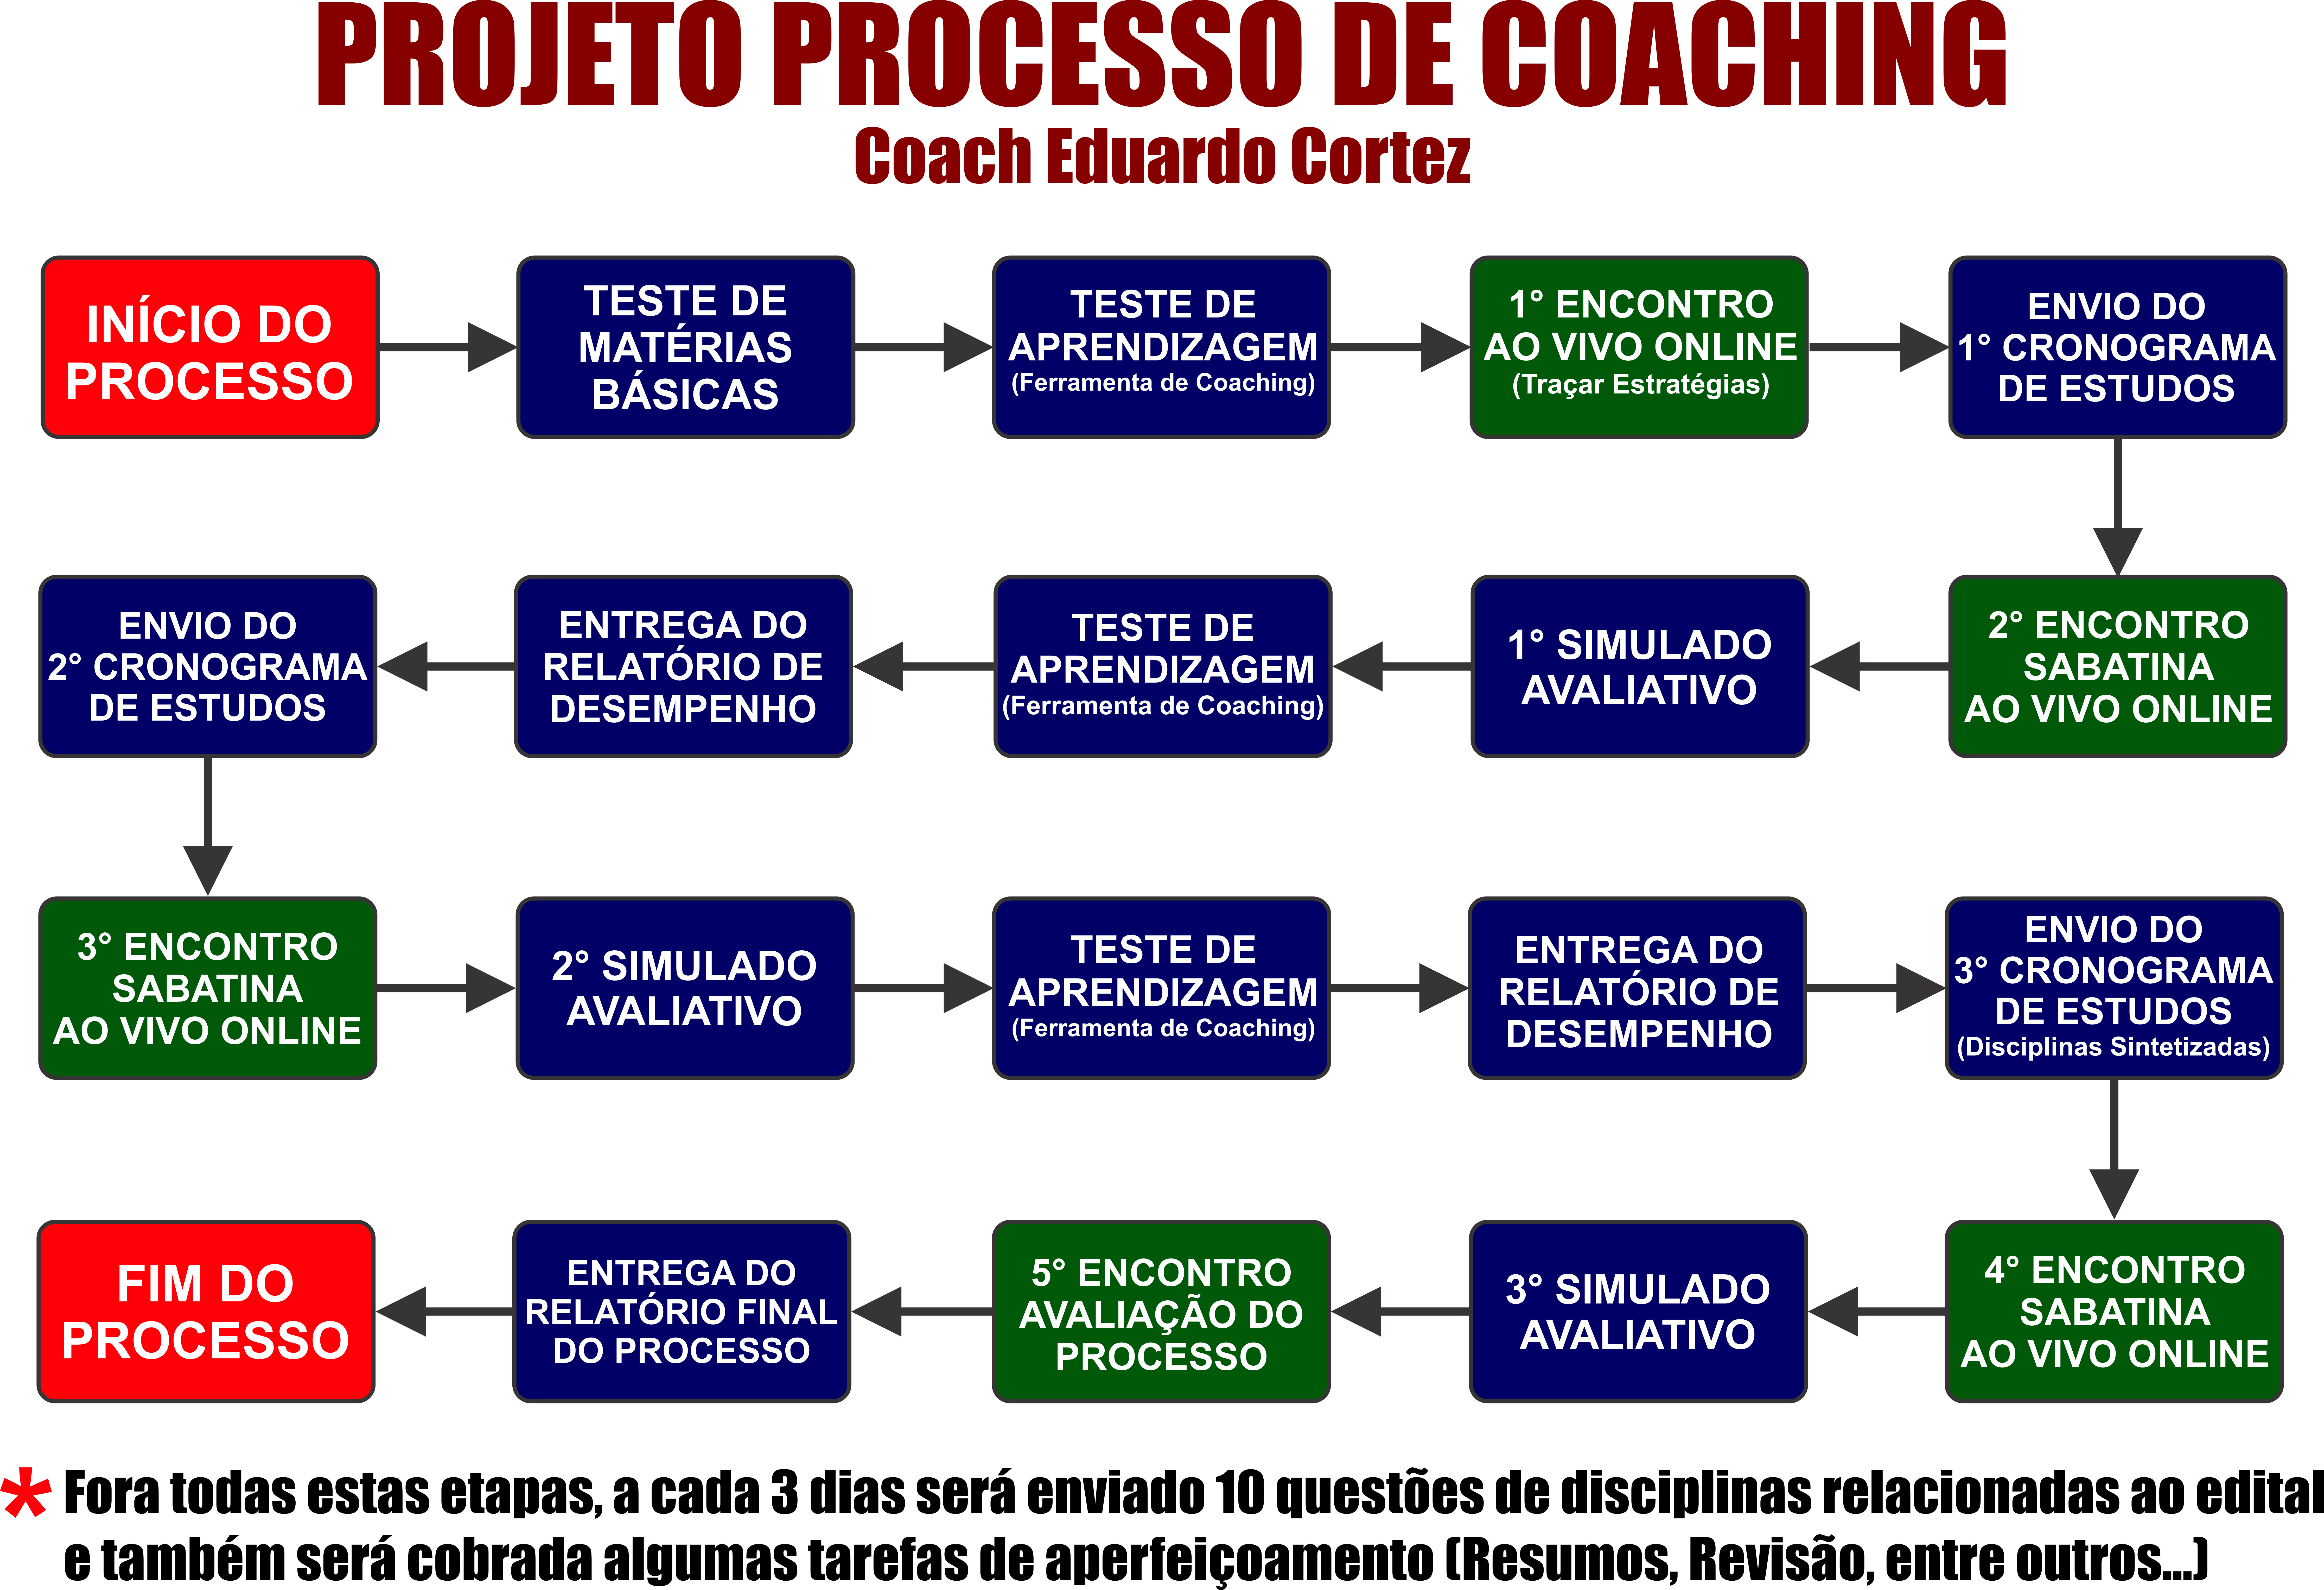 i.ibb.co/6NtTh4H/PROJETO-PROCESSO-DE-COACHING.png